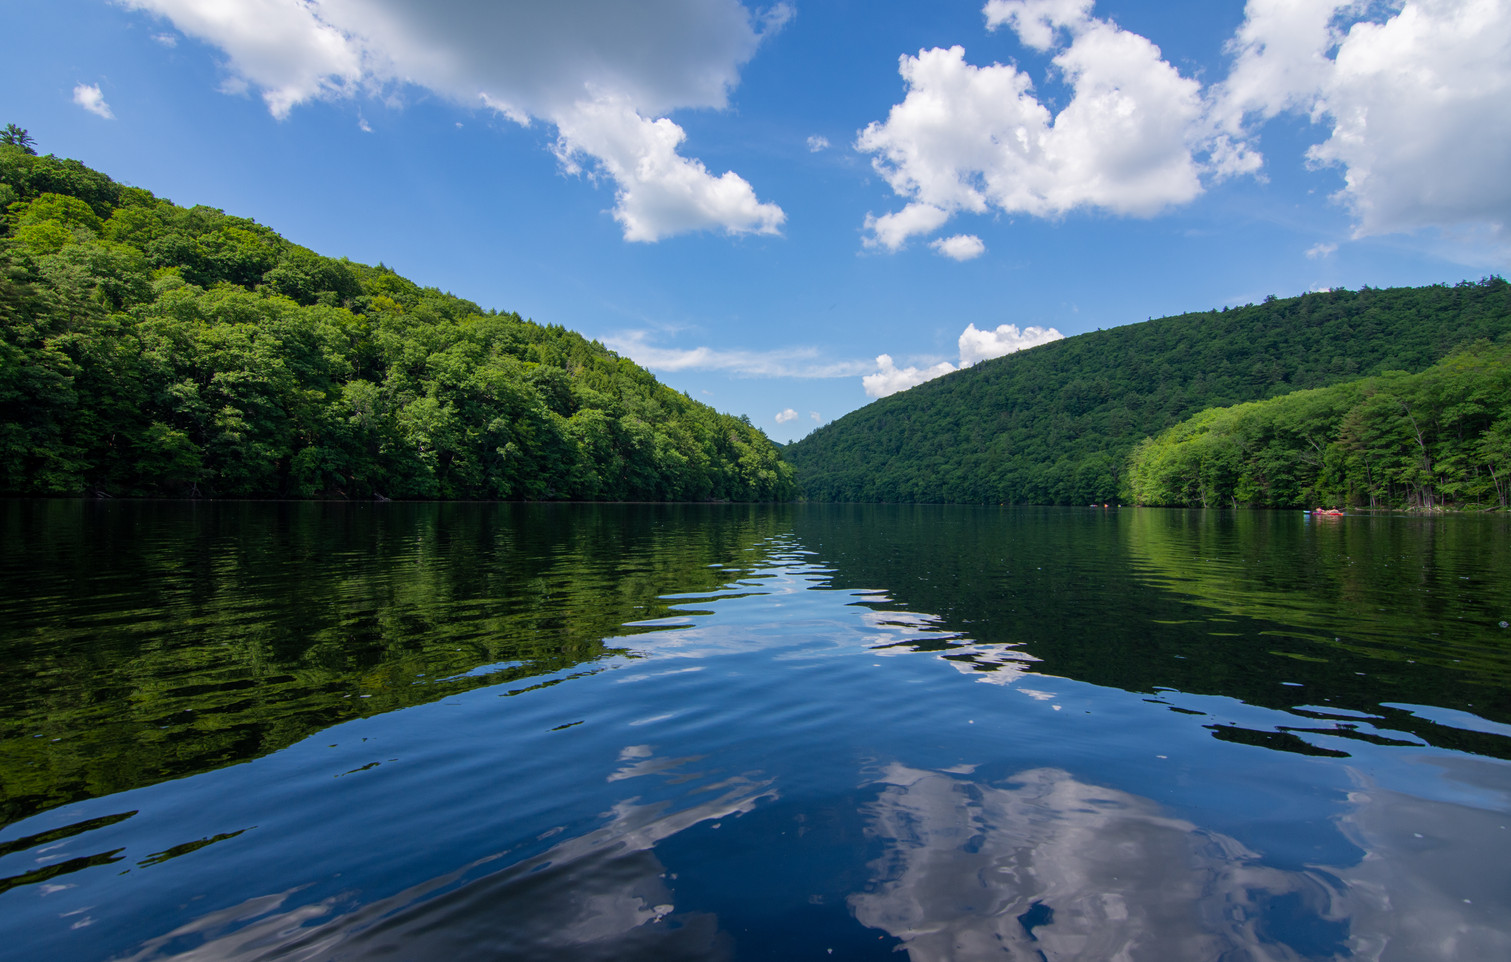 Adirondack Life Noxon Photography-3.jpg